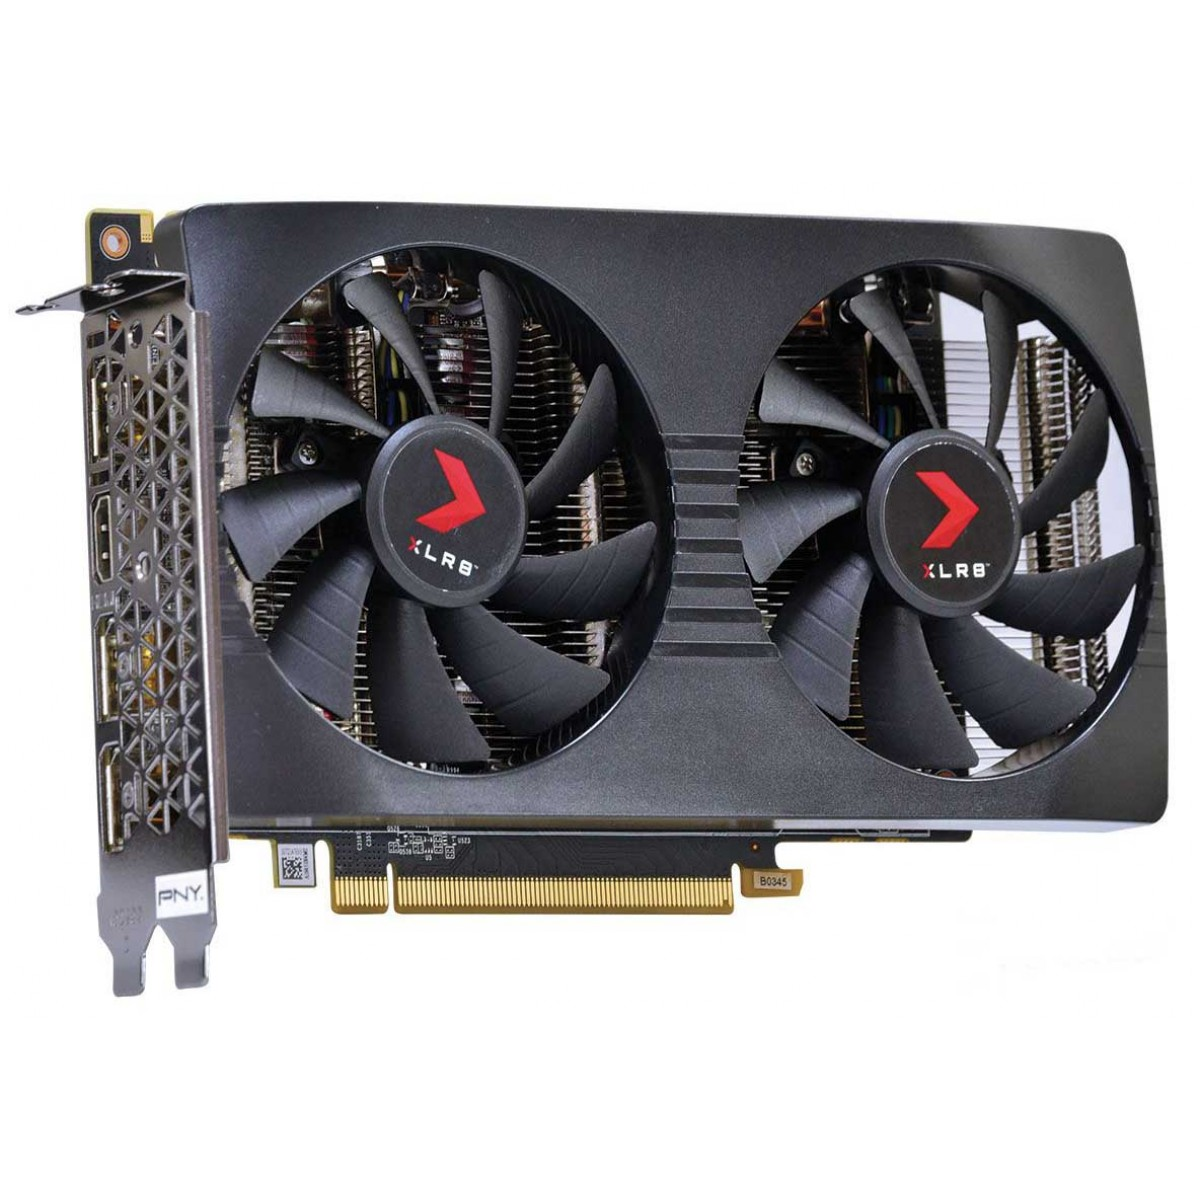 Placa de Vídeo PNY Geforce GTX 1060 XLR8 Gaming OC Dual, 6Gb GDDR5X, 192bit